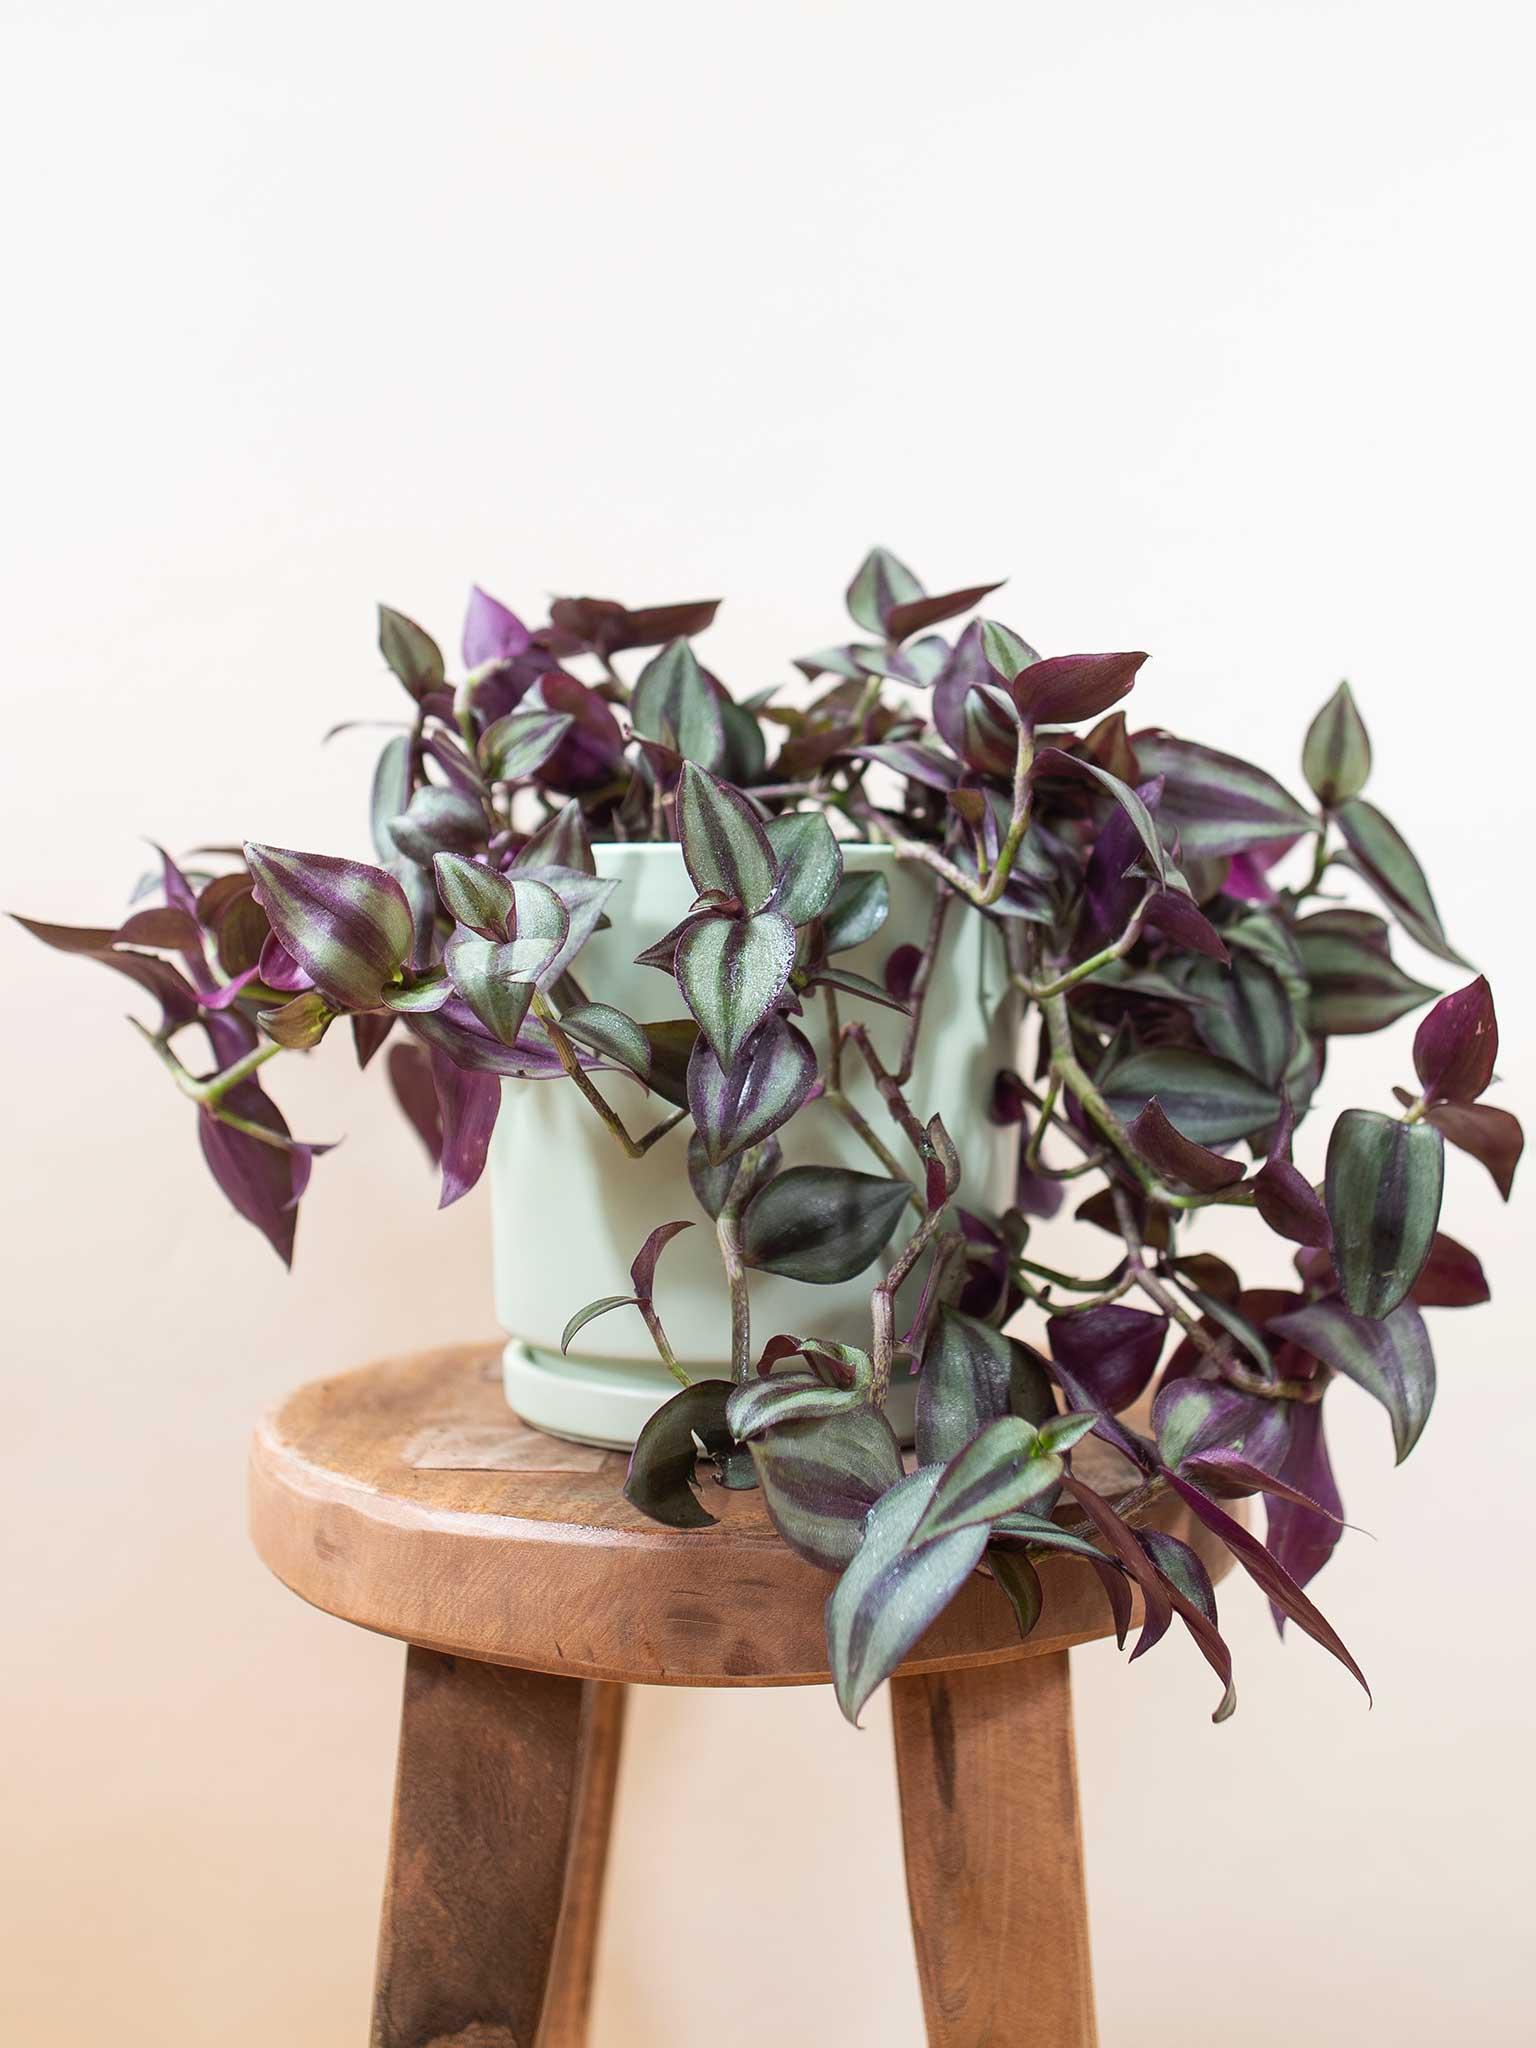 Photo of the Zebrina plant on a stool